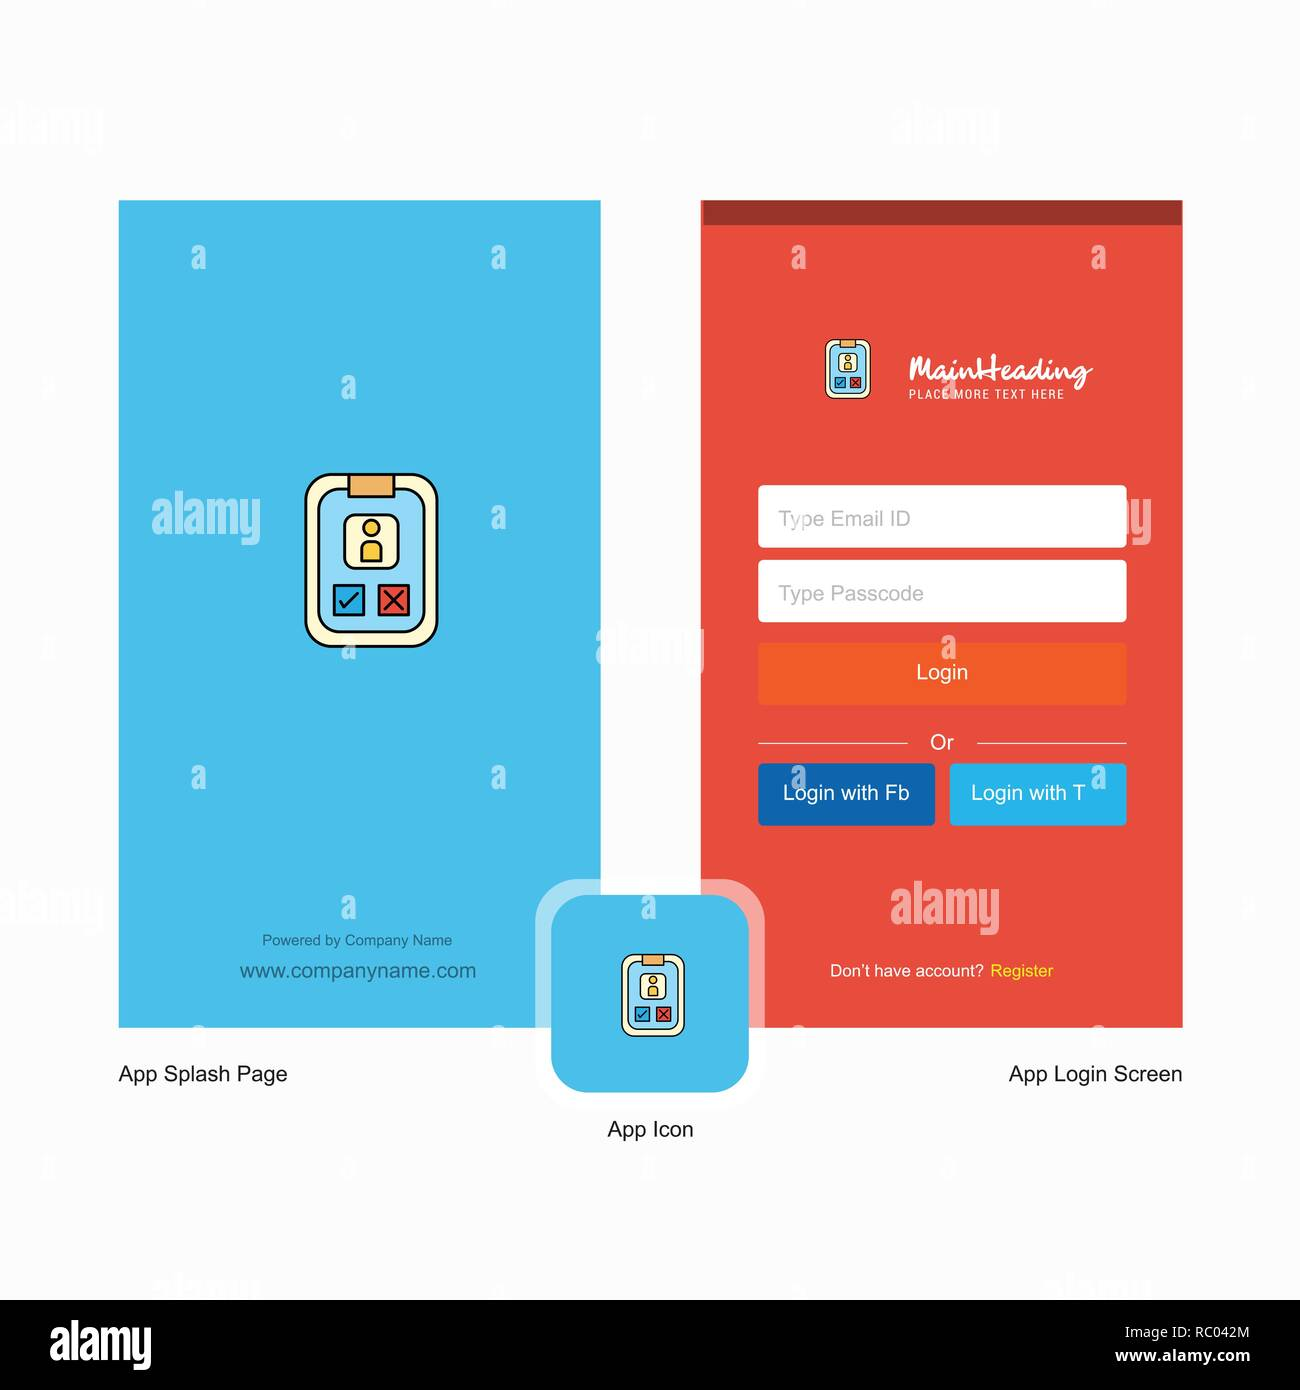 Company Social Media User Profile Splash Screen And Login Page